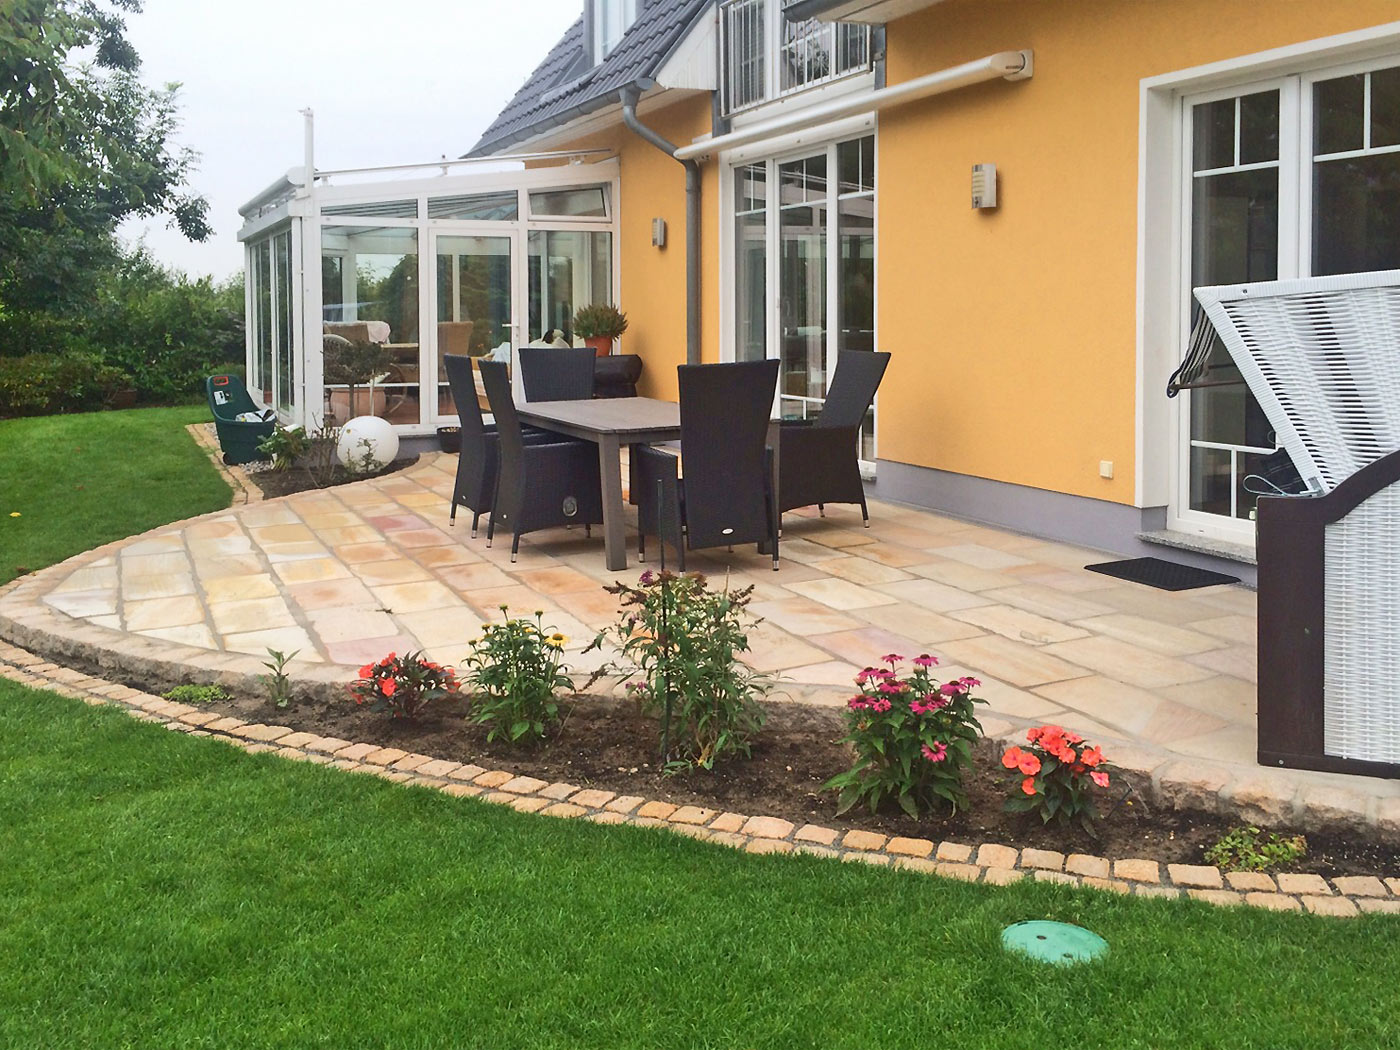 Outdoorküche Garten Rostock : Terrassendach terrassenüberdachung rostock